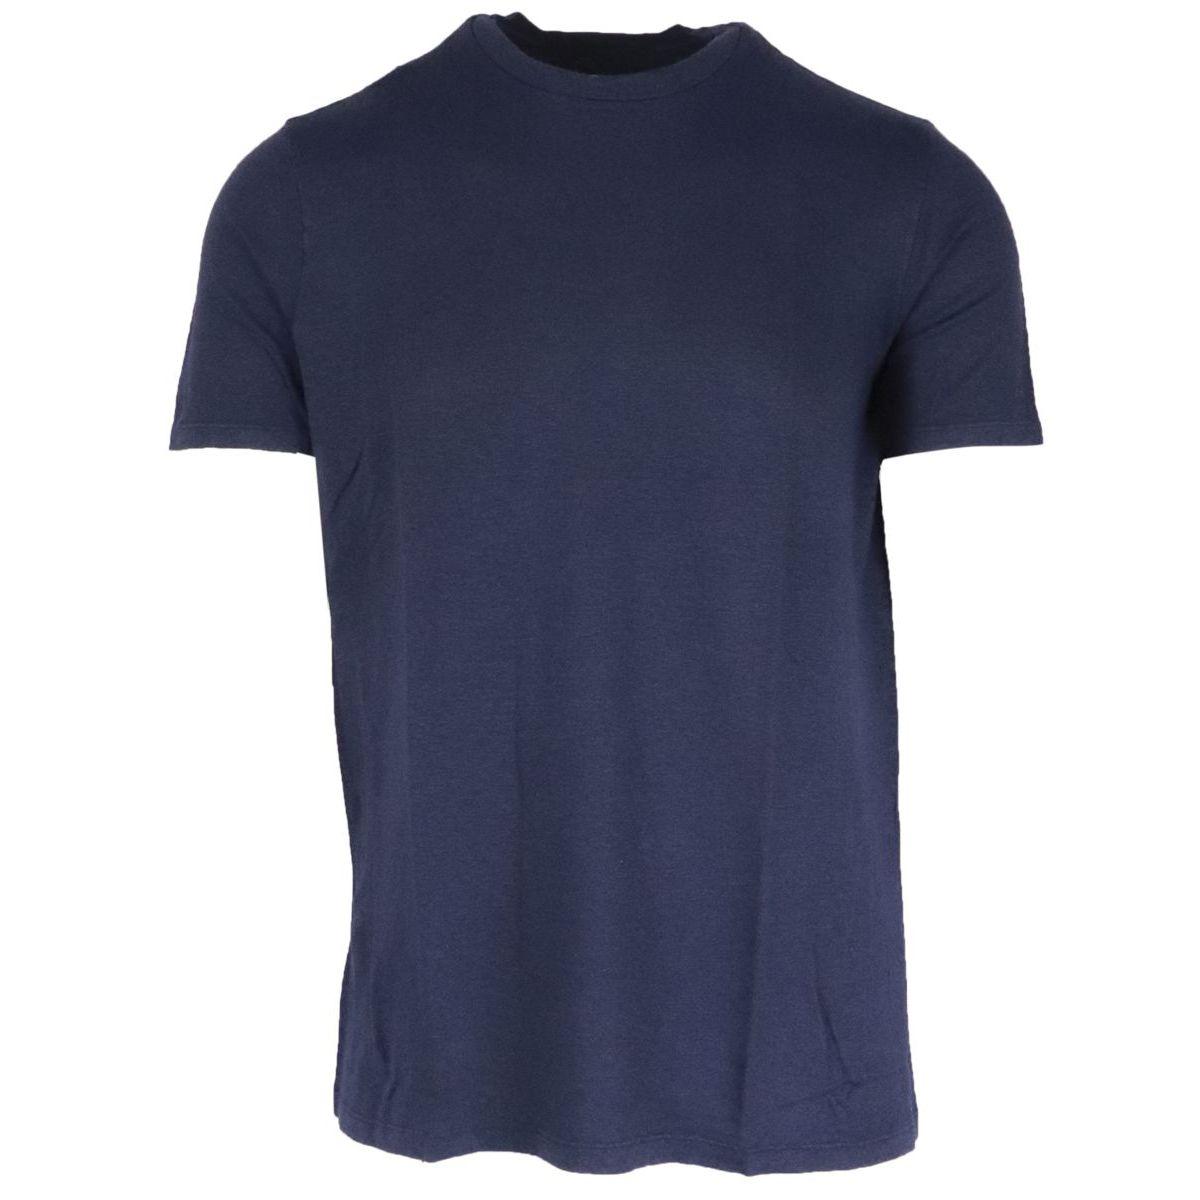 1. Altea linen short sleeve crewneck T-shirt Navy Altea